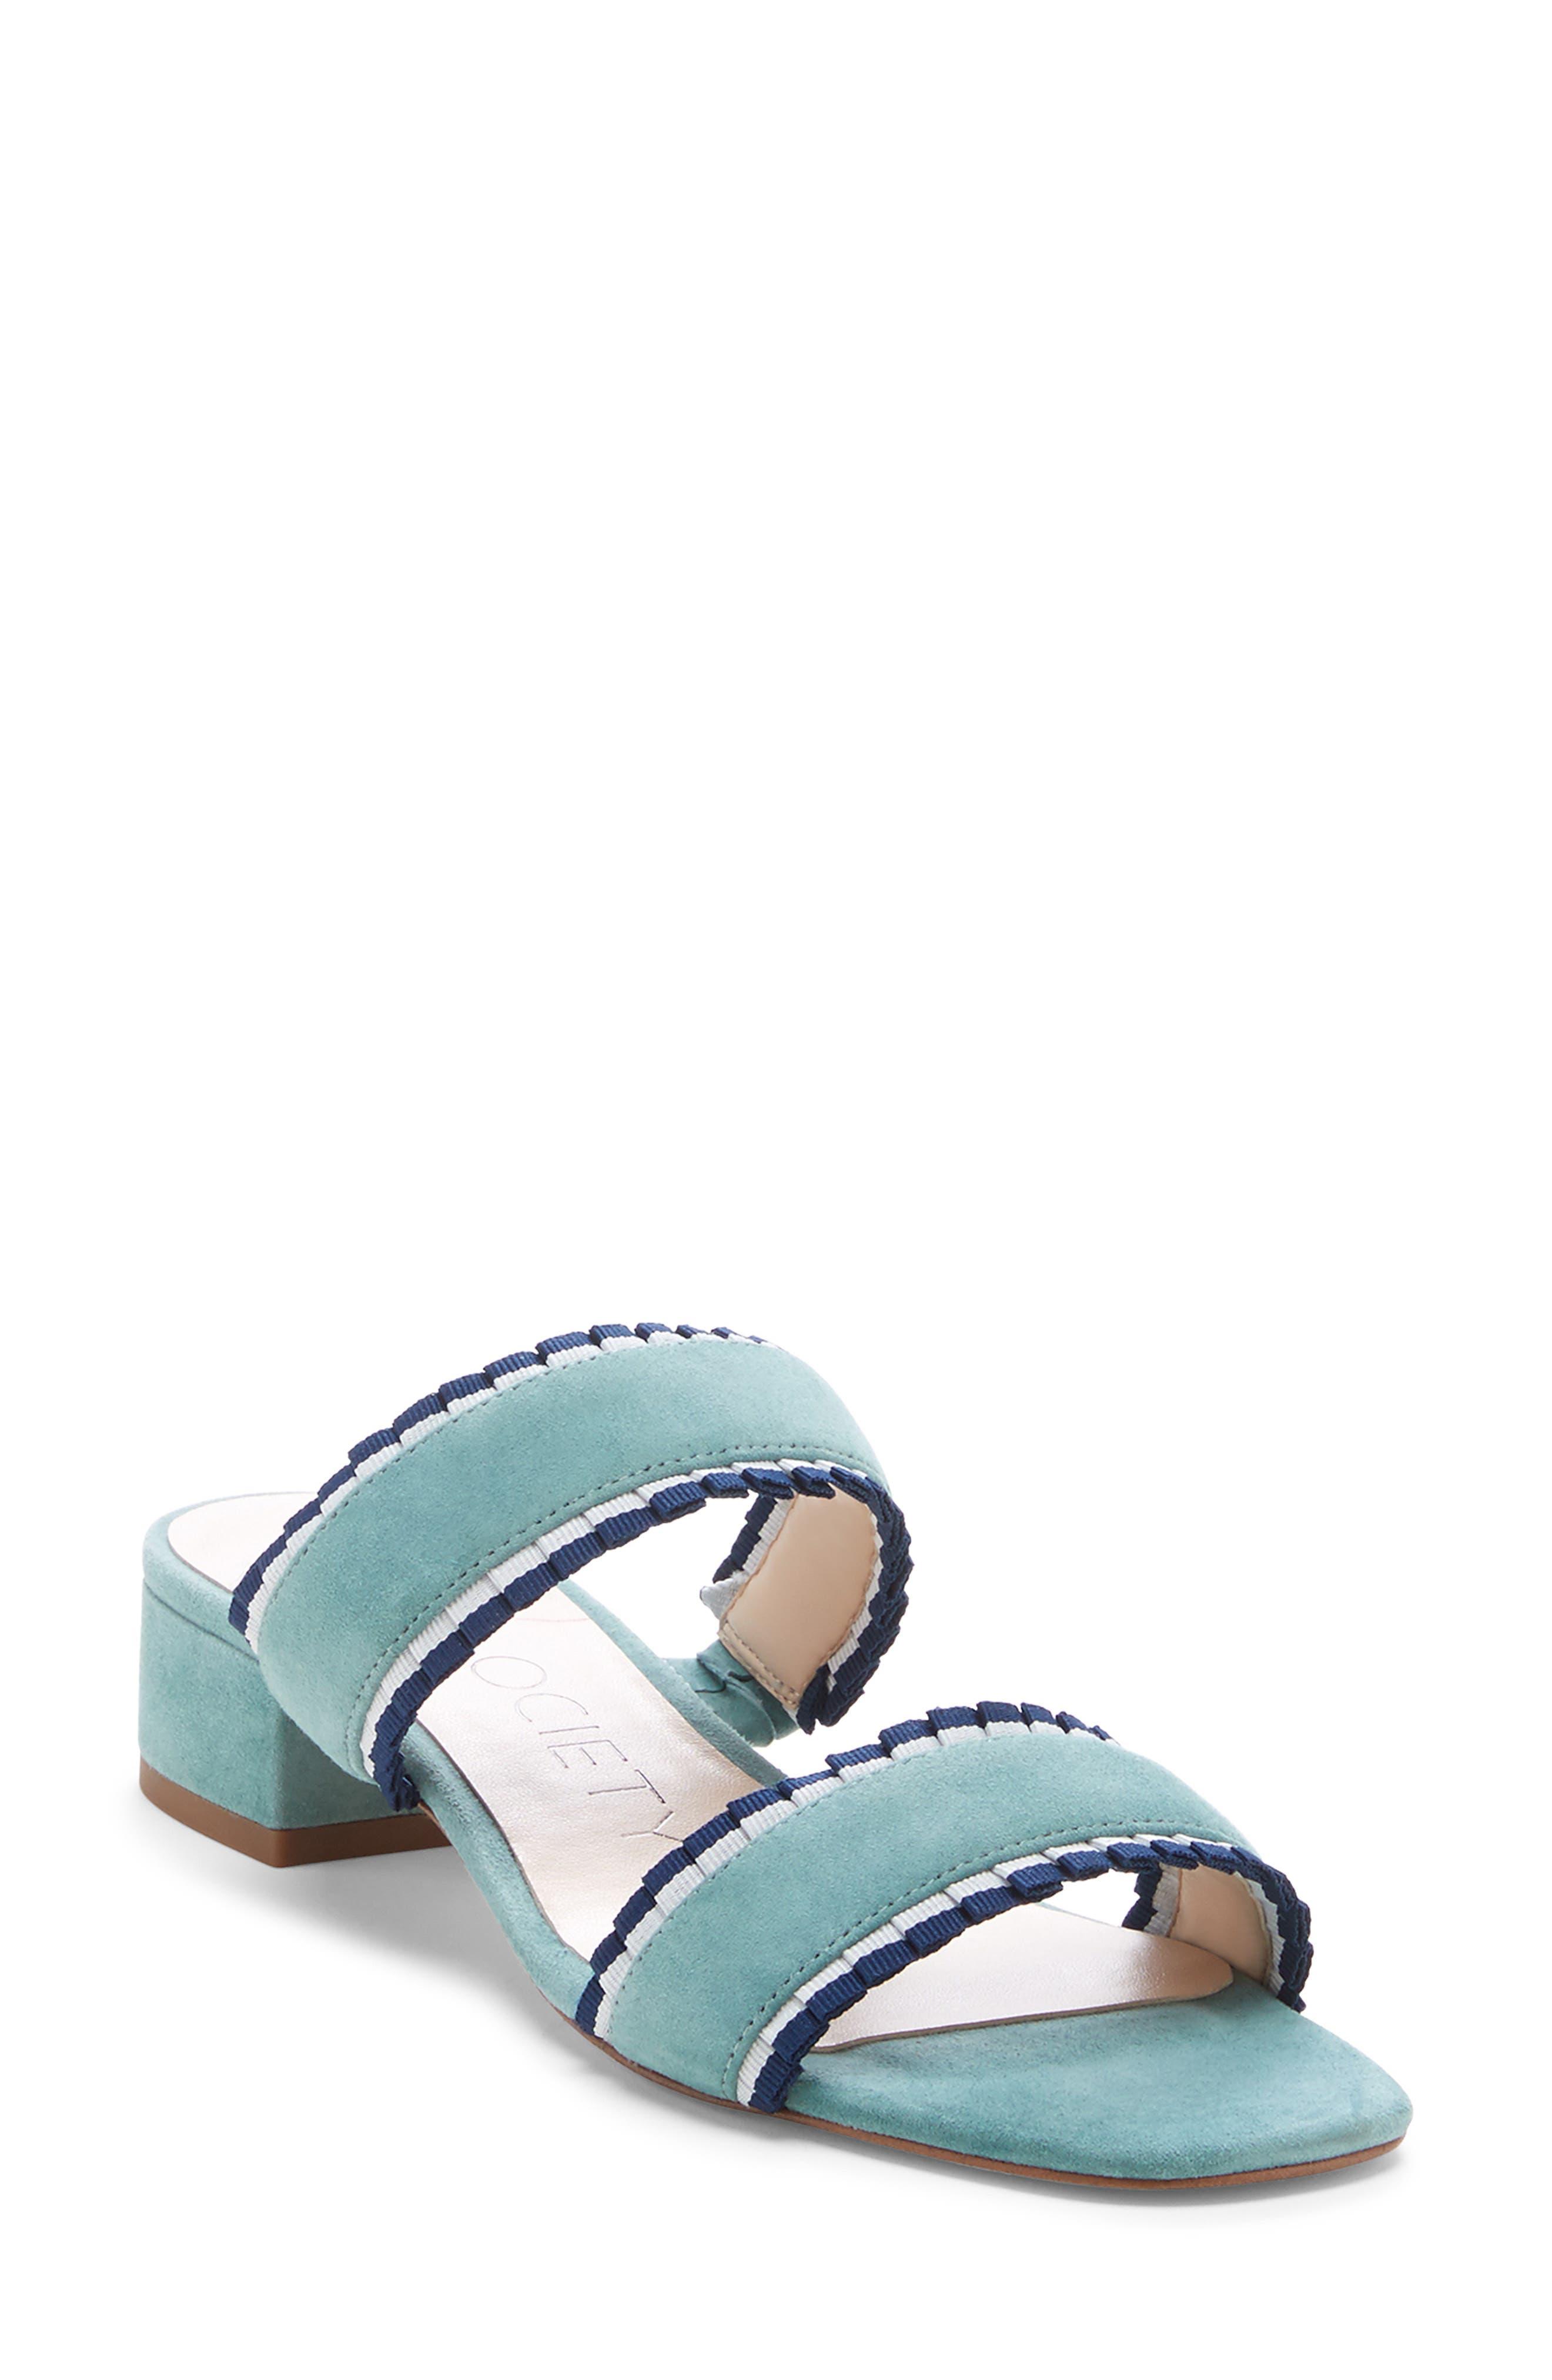 SOLE SOCIETY Elura Slide Sandal, Main, color, LIGHT SEA GREEN SUEDE